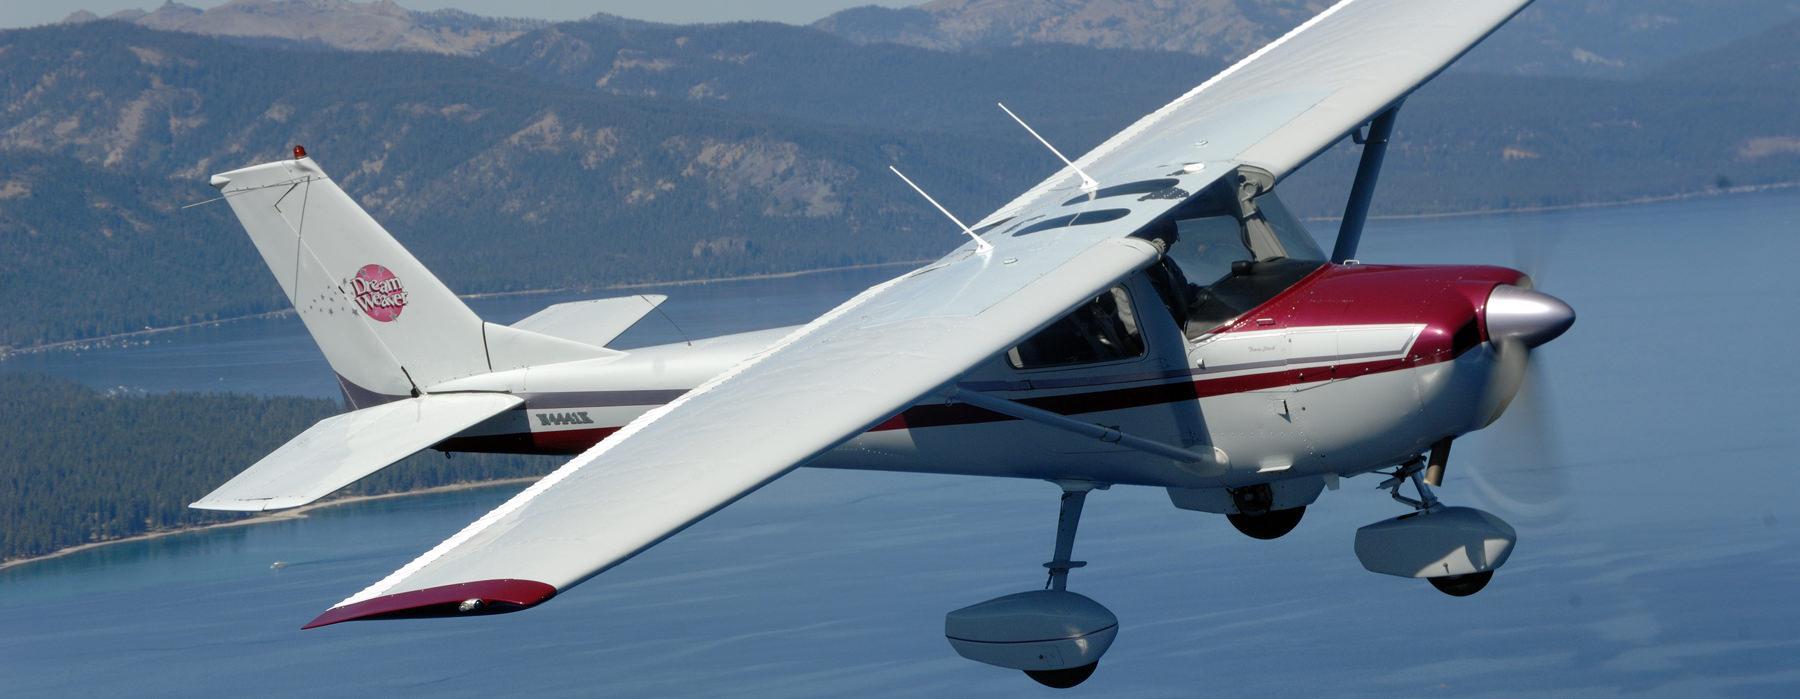 Cessna Flyer Association Articles And News